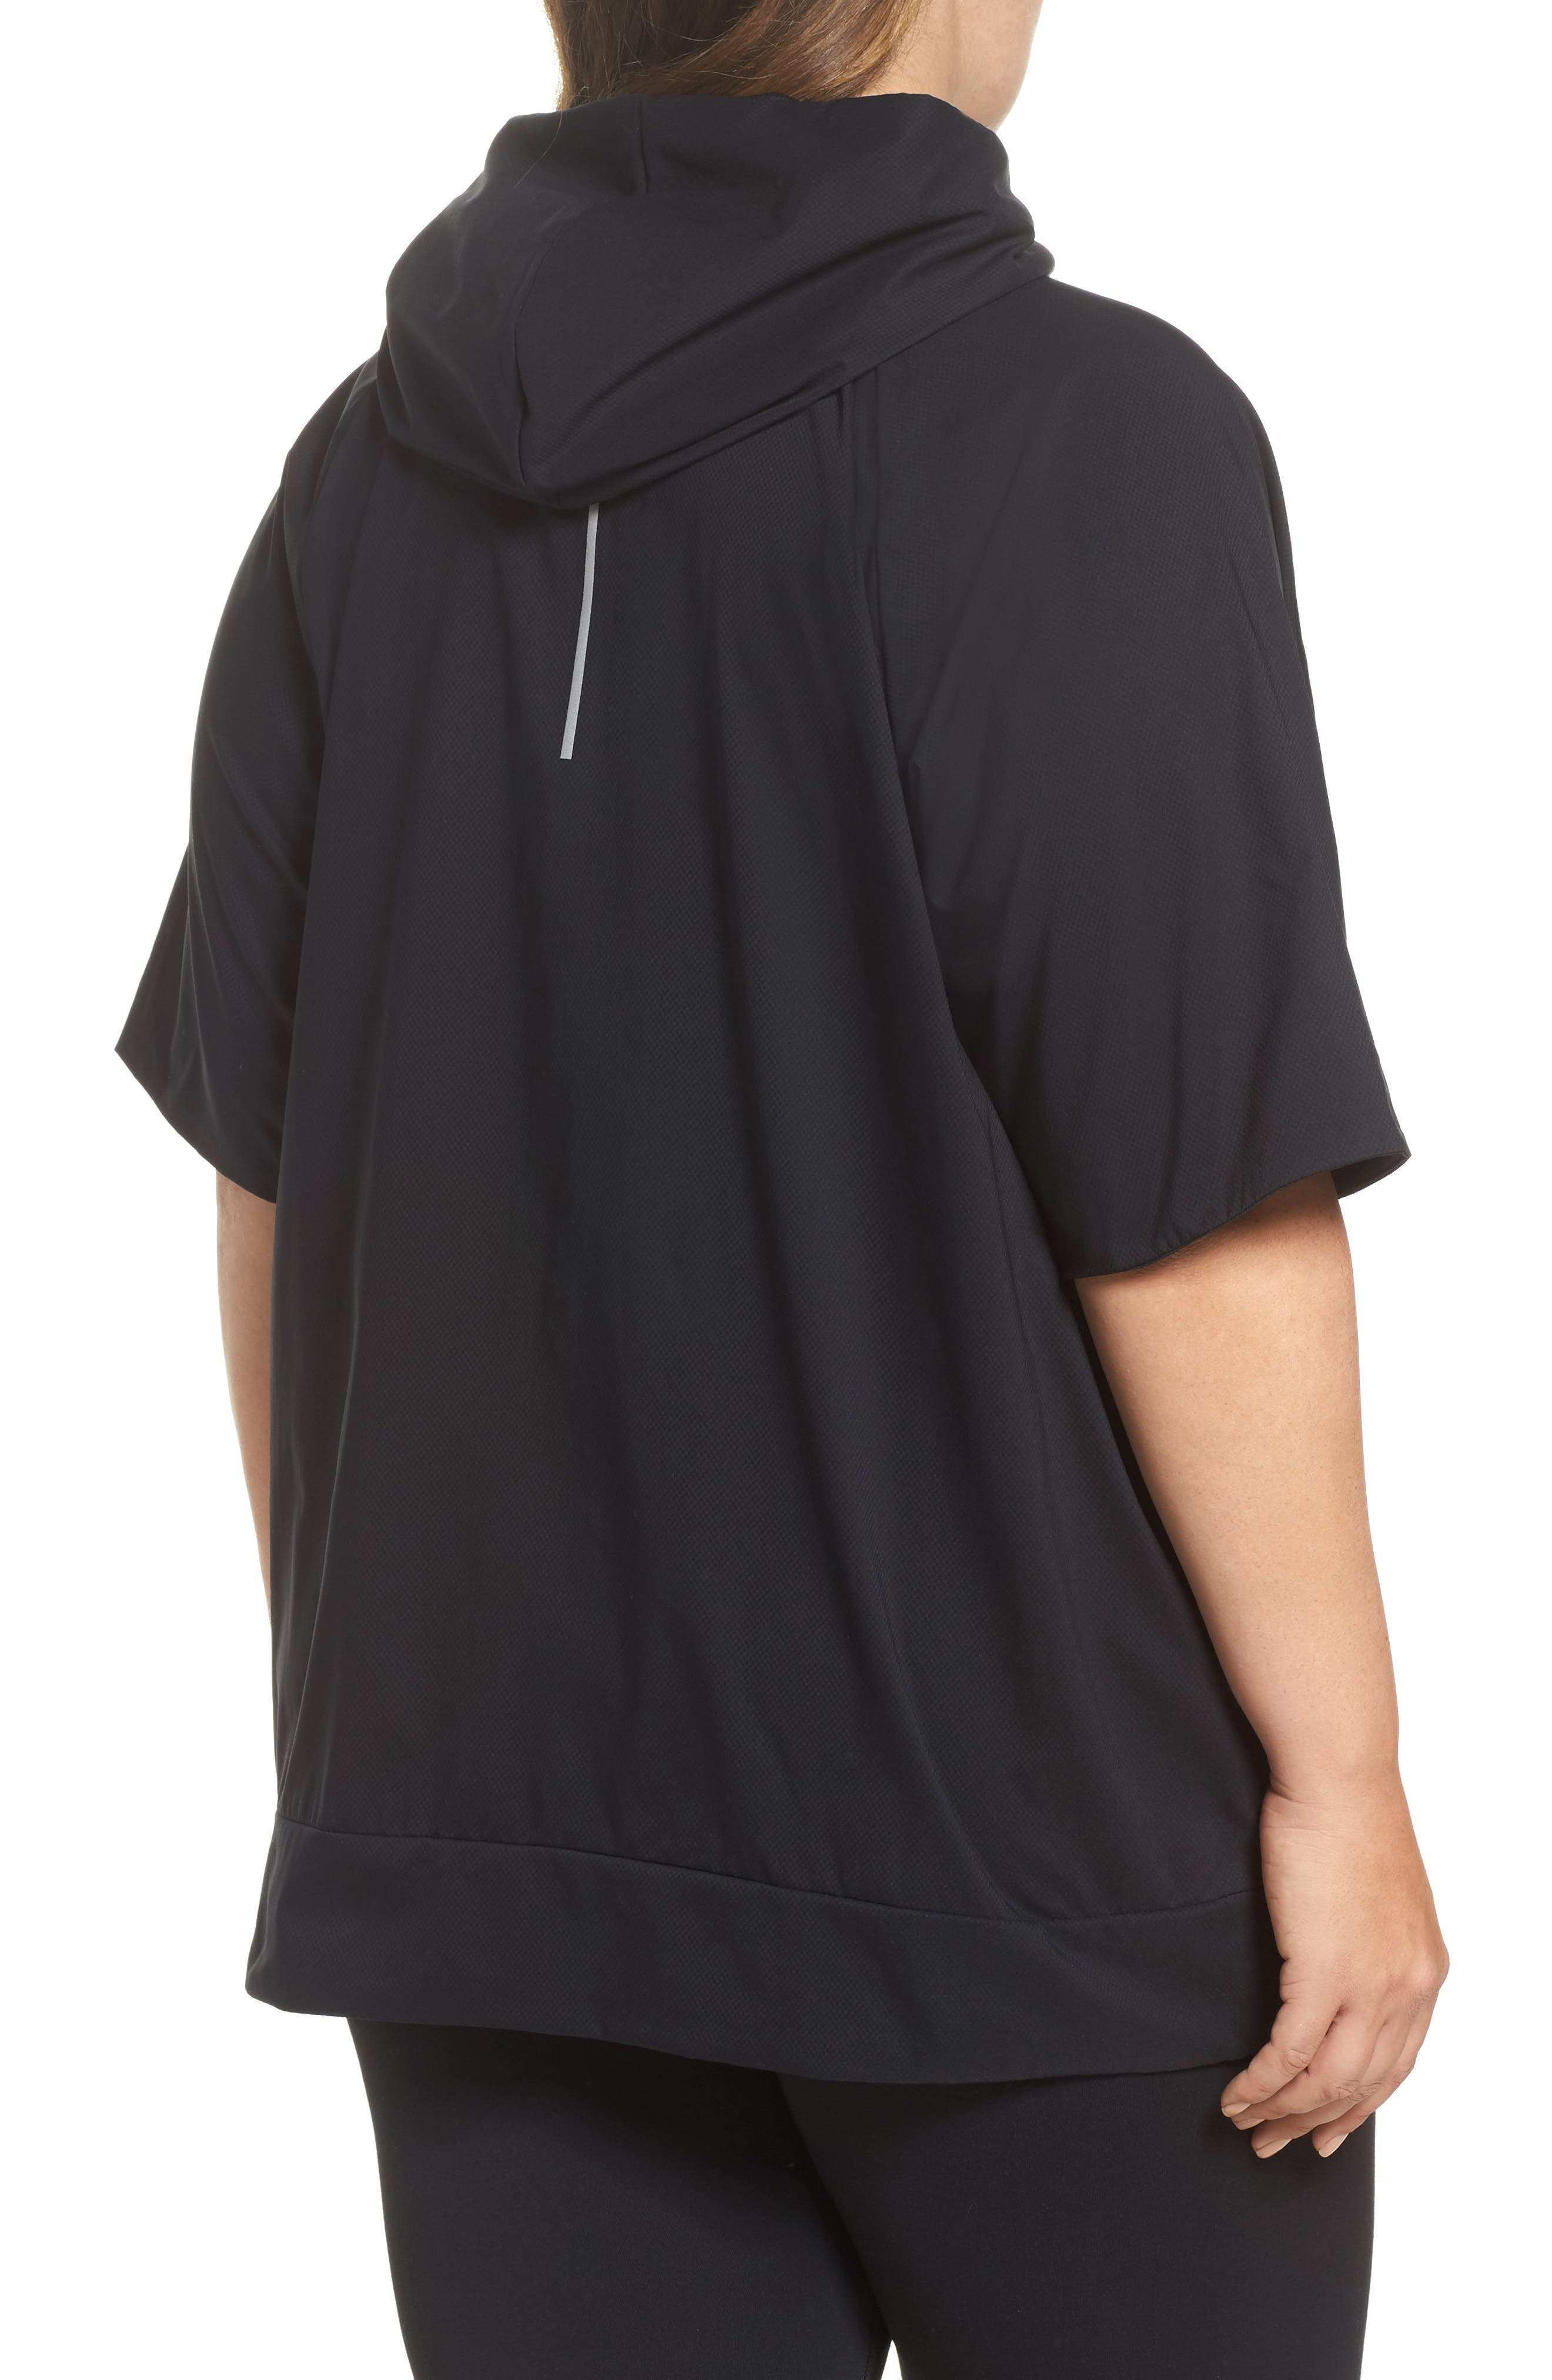 Flex Hooded Running Jacket,                             Alternate thumbnail 2, color,                             010